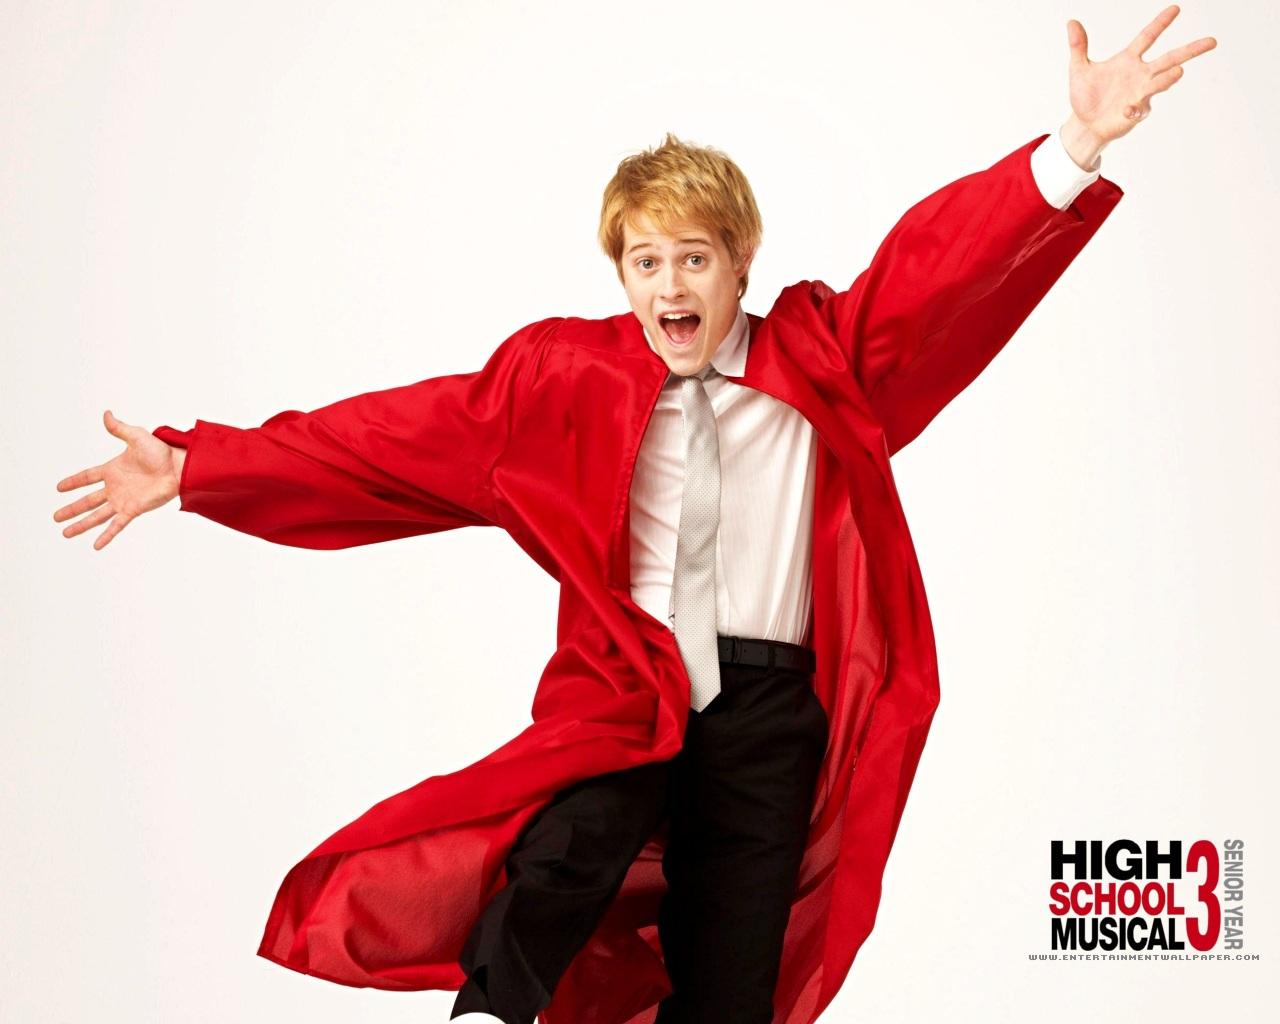 High School Musical 3 Stream Movie4k